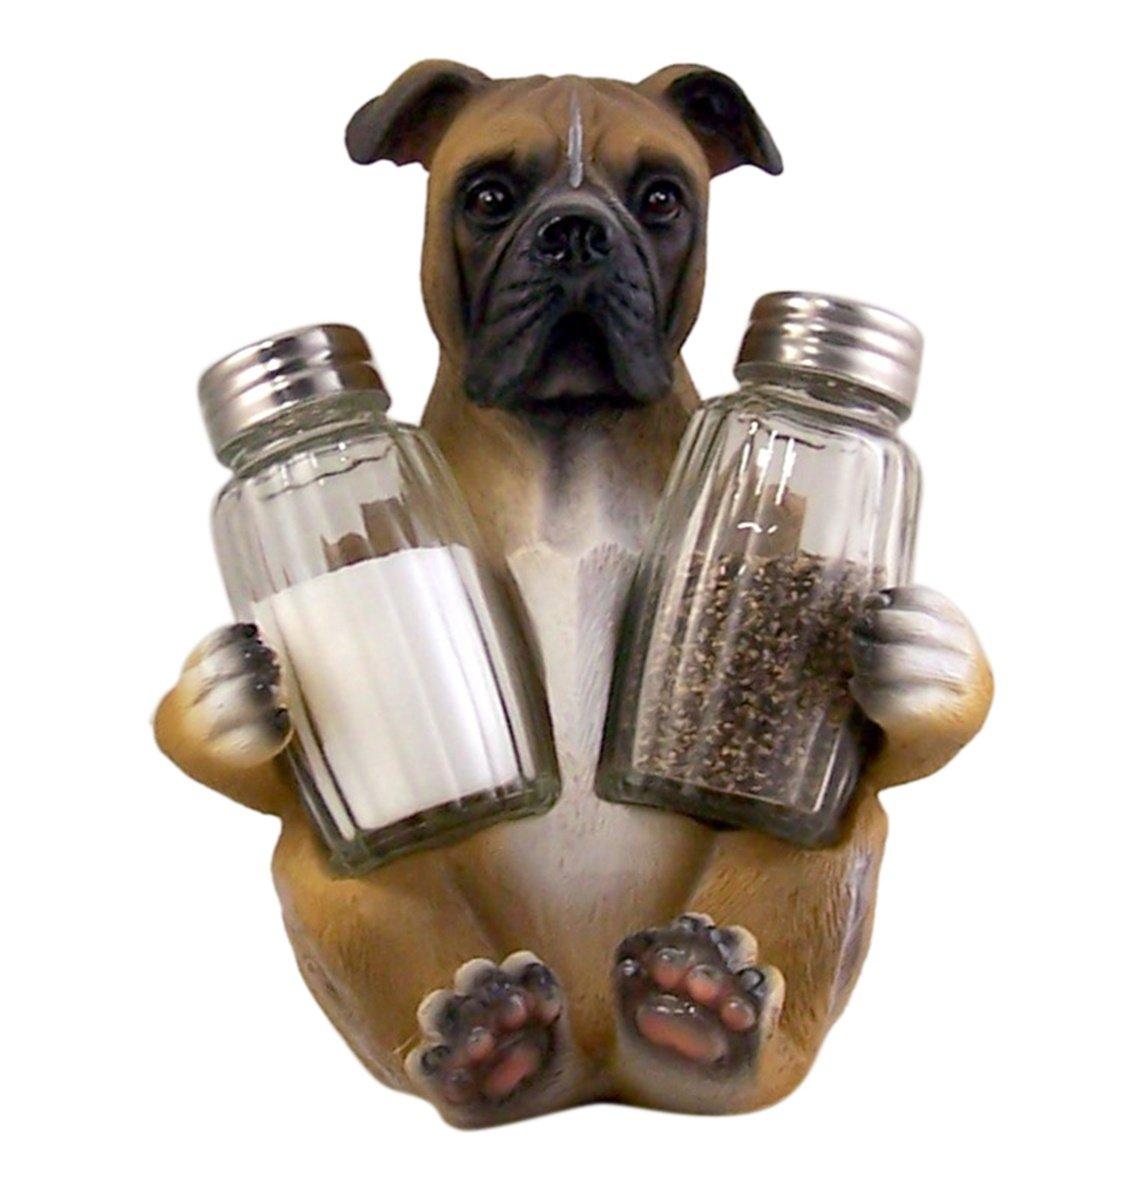 Boxer Dog Salt and Pepper Shaker Holder (Shakers Included) DWK Corporation